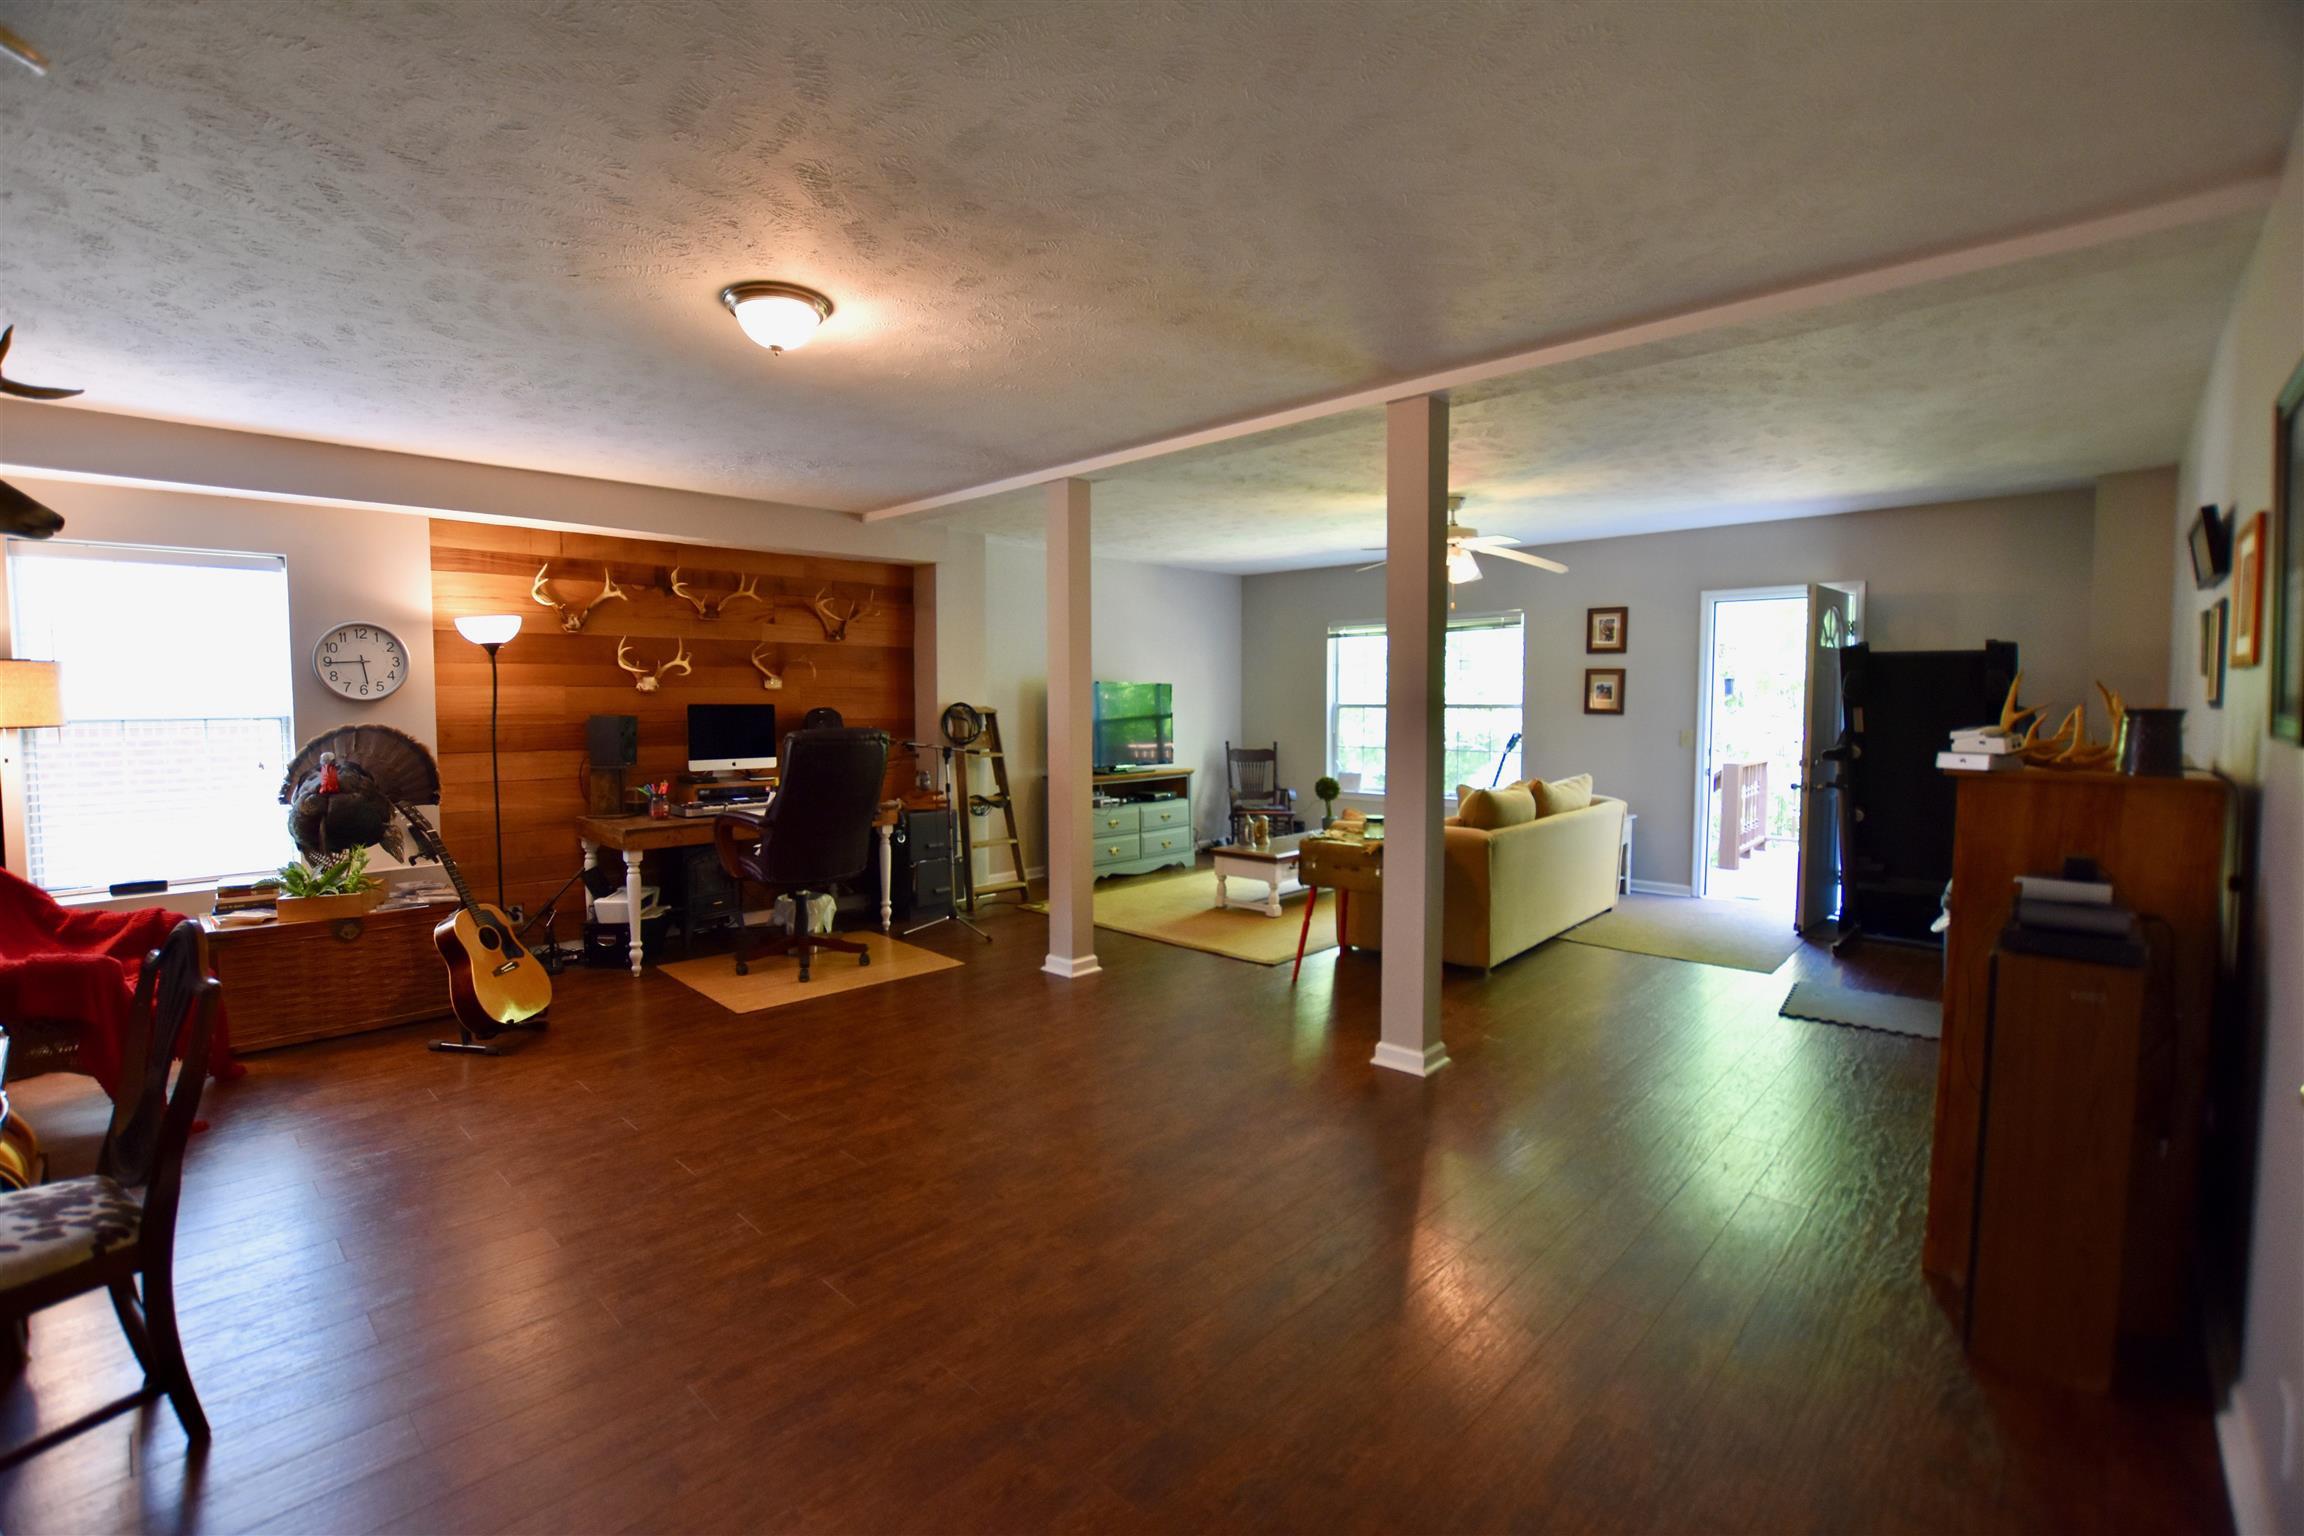 Hardwood Flooring Nashville Tn Of 4322 Barnes Cove Dr Nashville Tn 37211 Realestate Com Inside isql93i64ld95b0000000000